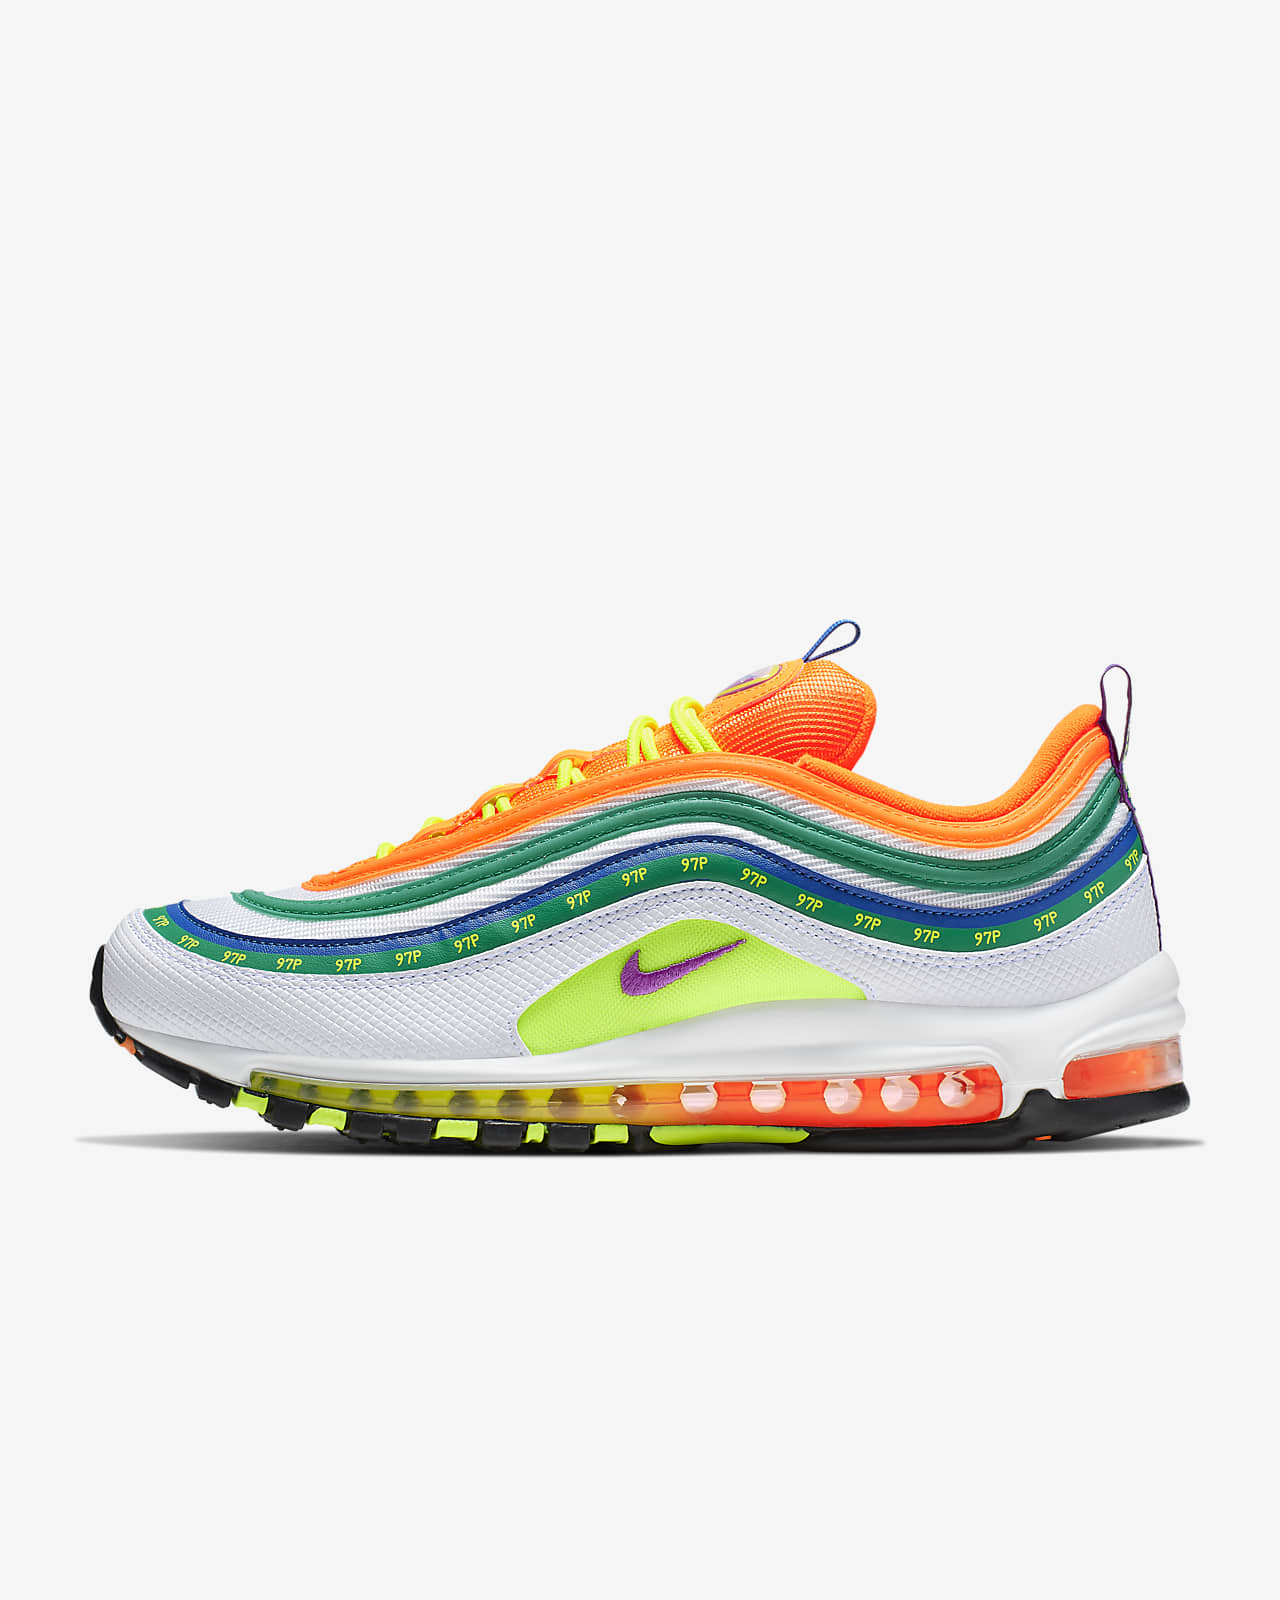 Nike Air Max 97 On Air Jasmine Lasode Shoe